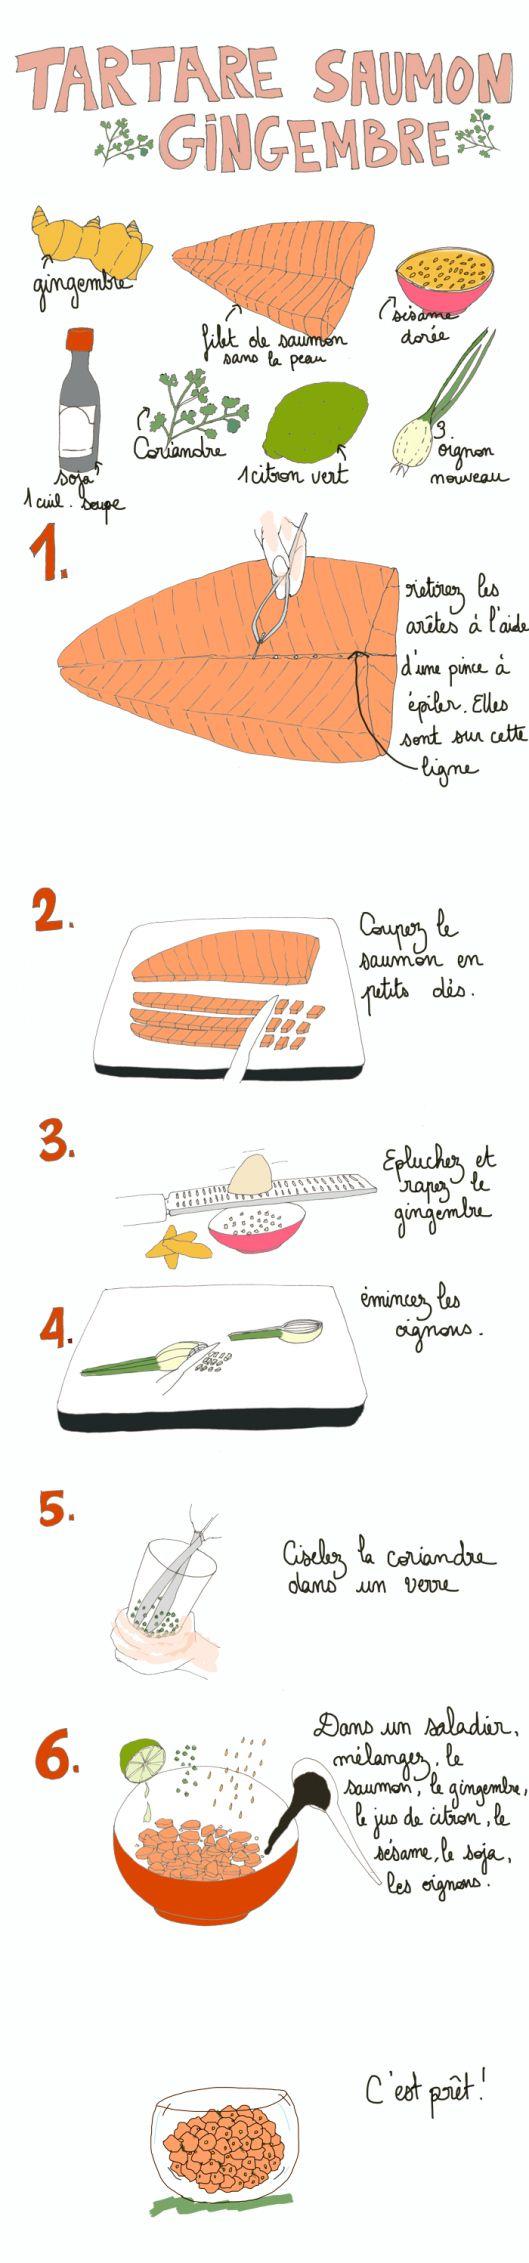 Tartare de Saumon au gingembre                                                                                                                                                                                 Plus